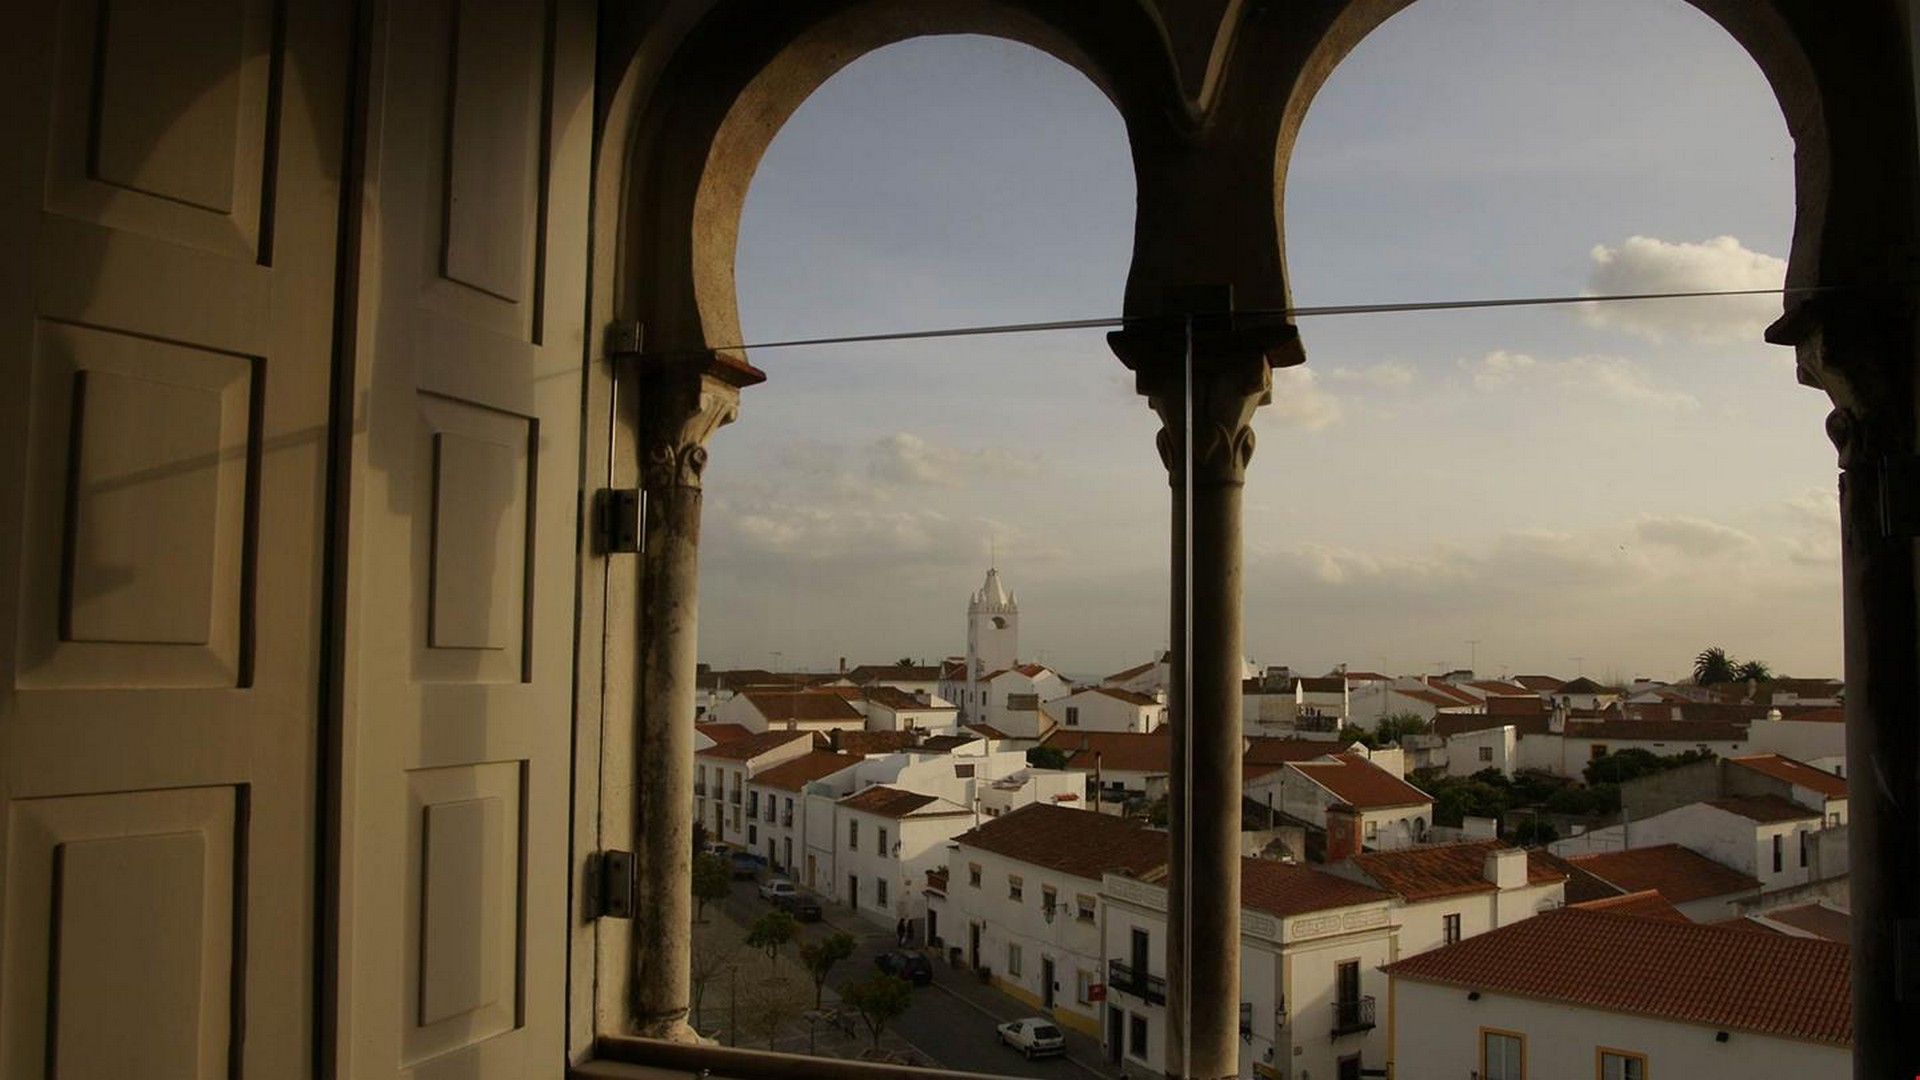 Historic Hotels in Portugal: Castelo Alvito historic hotels in portugal Historic Hotels in Portugal That You Can't Miss Historic Hotels in Portugal 3